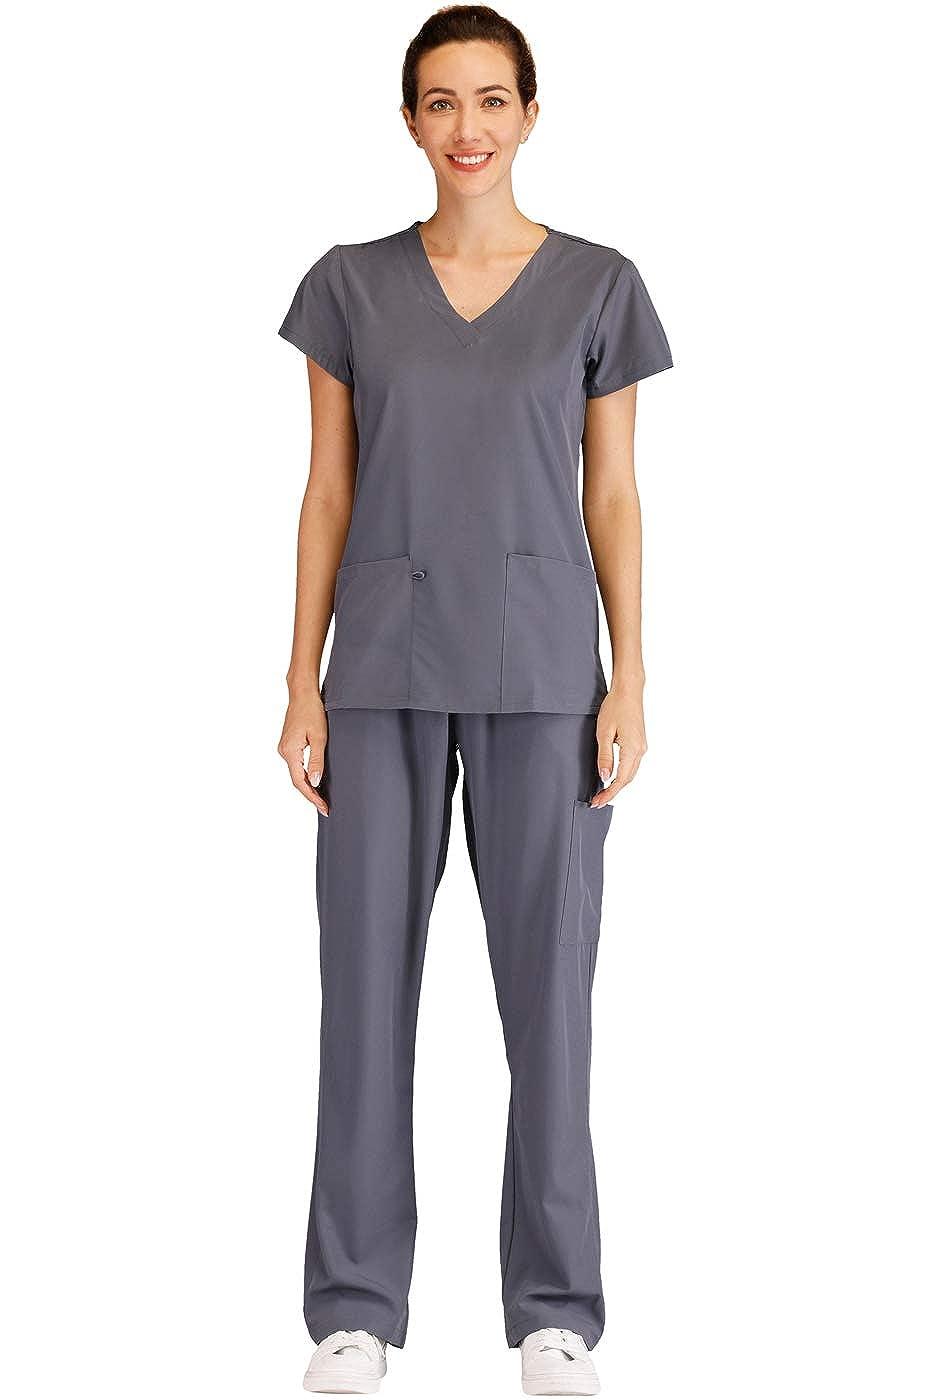 Grey Minty Mint Women's V Neck Solid Stretch Medical Scrub Set